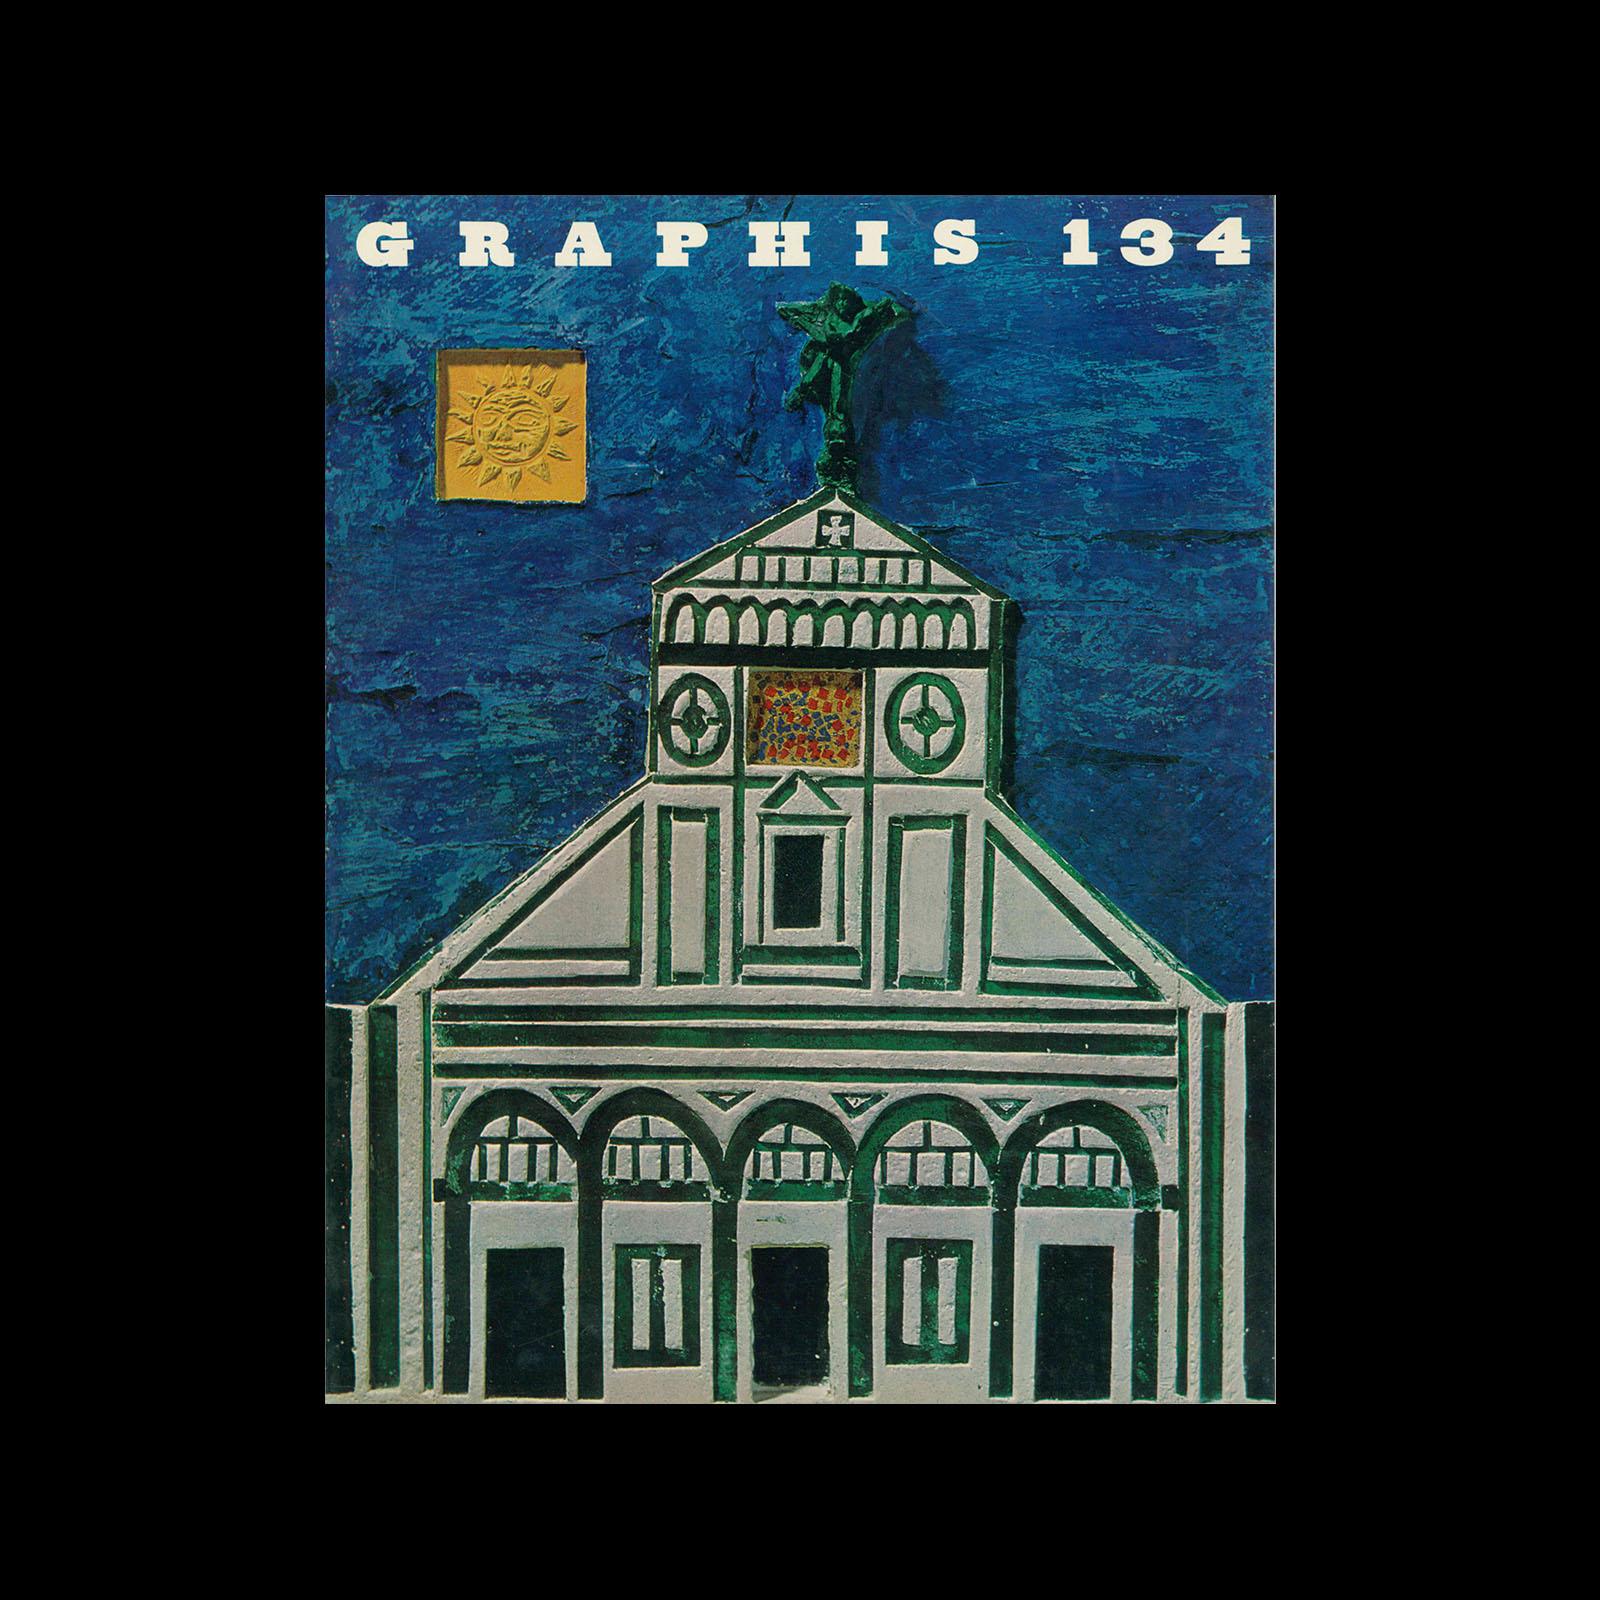 Graphis 134, 1967. Cover design by Antonio Frasconi.